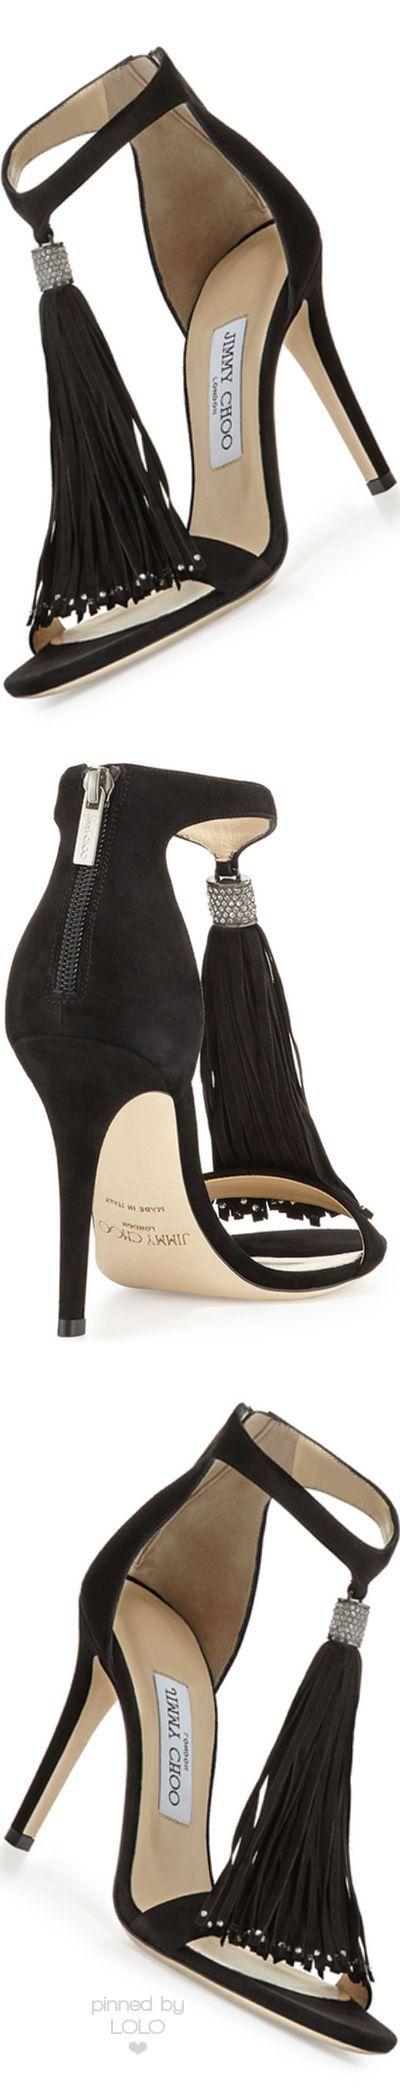 07912b8cb2c List of Pinterest shoes heels wedges boots jimmy choo ideas   shoes ...